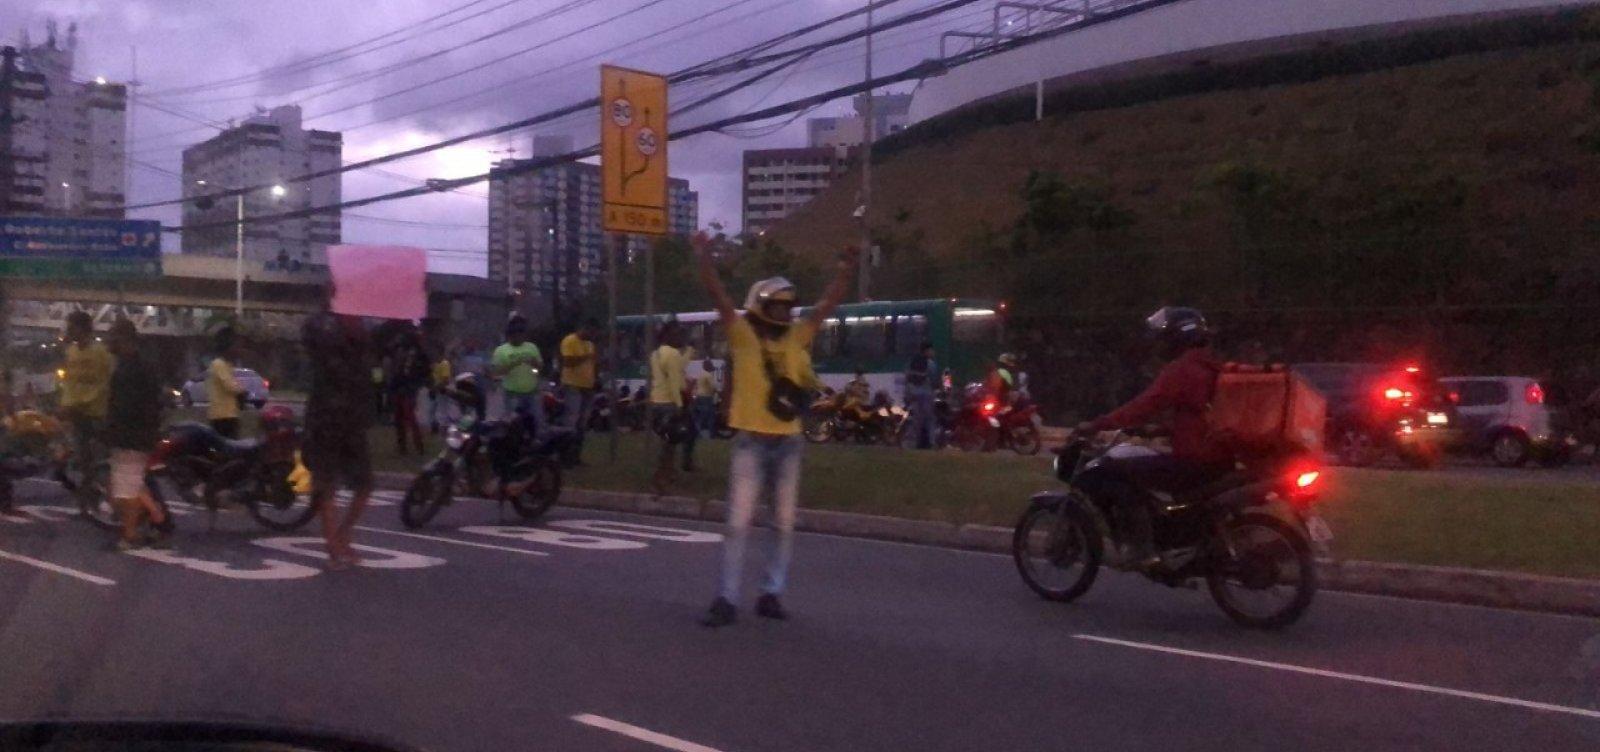 Contra aumento no preço de gasolina, protesto de mototaxistas trava Avenida Paralela